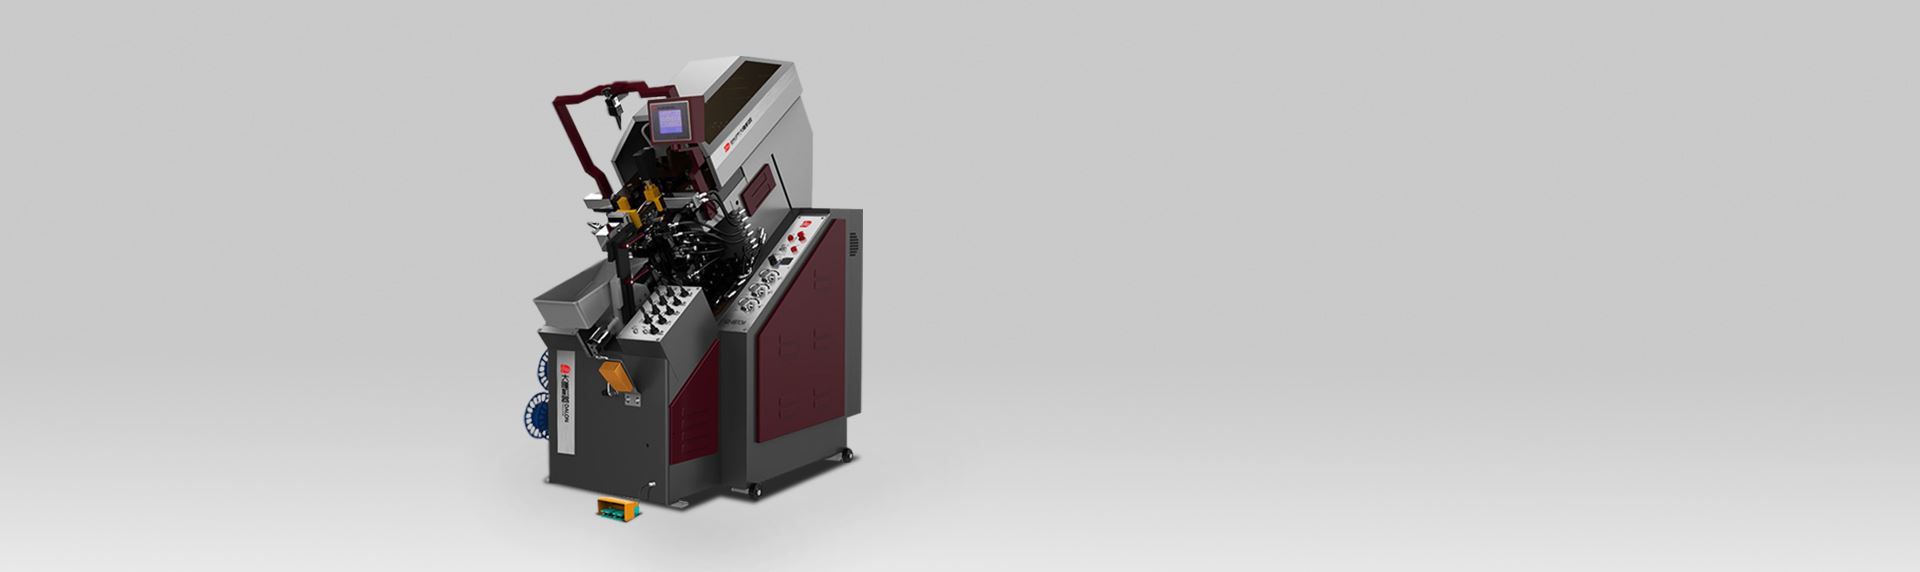 SSC设计-电脑控制自动上胶前帮机